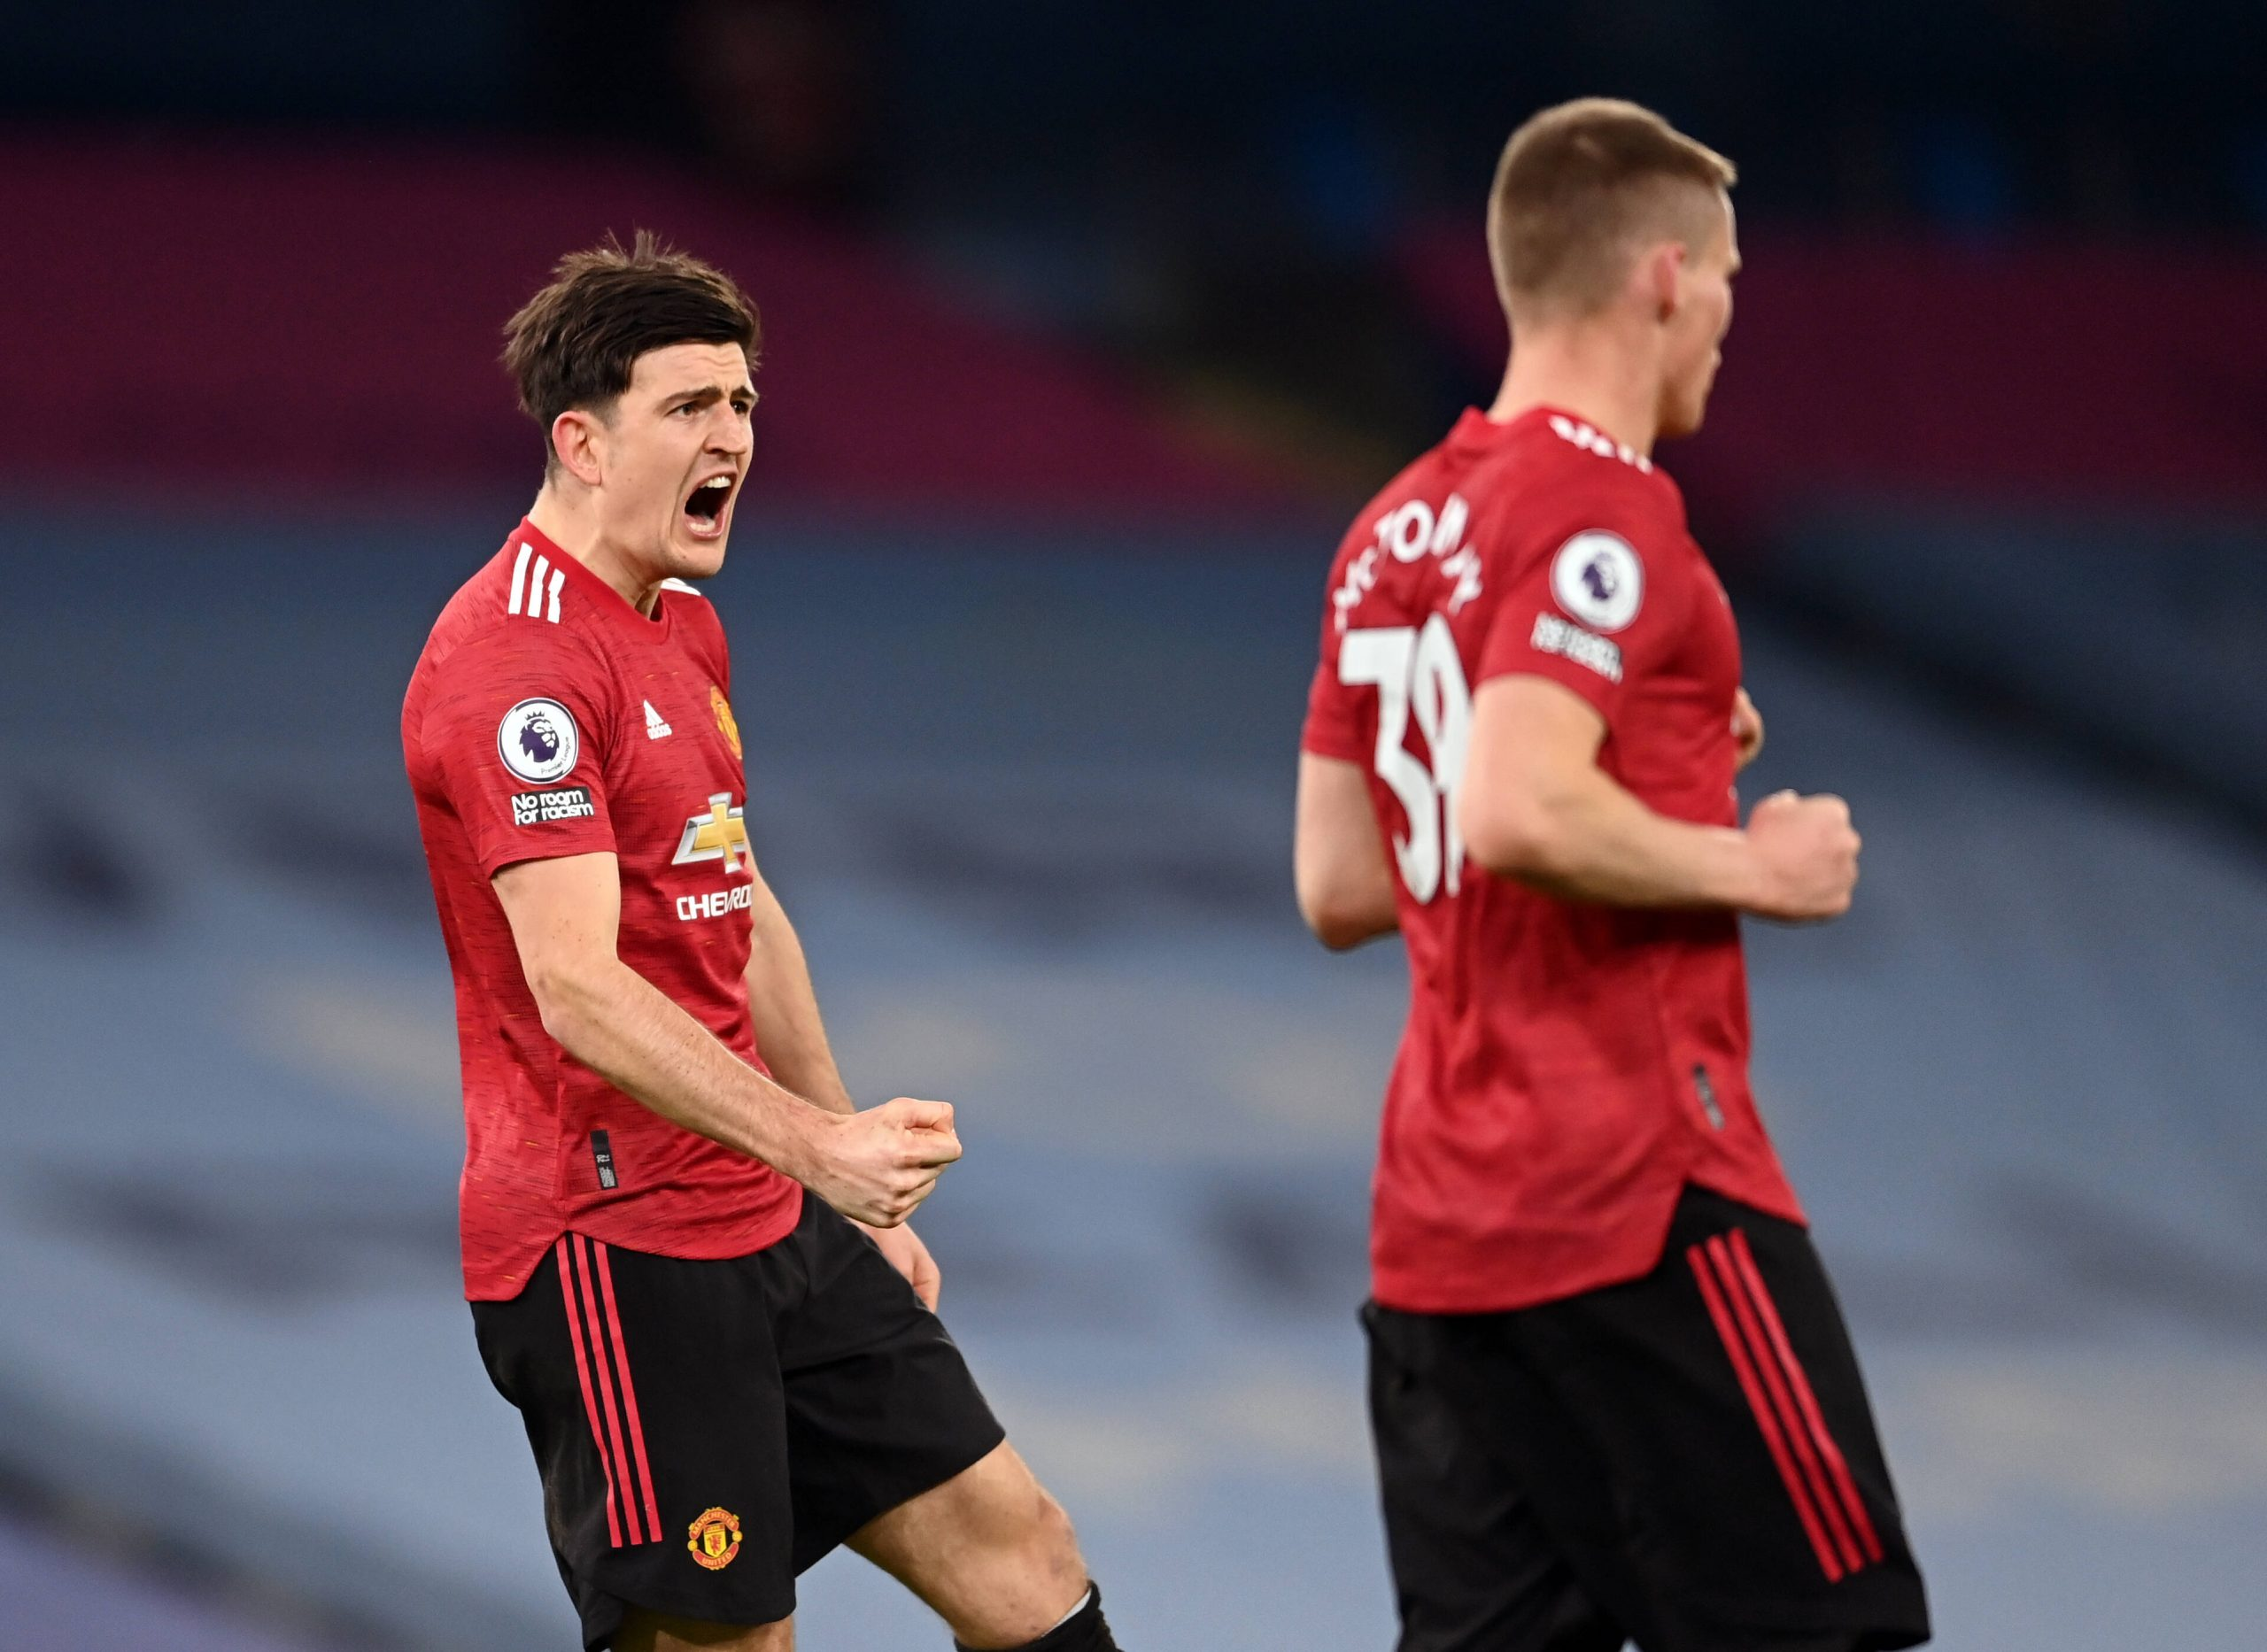 Ole Gunnar Solskjaer defended Manchester United captain Harry Maguire for shouting instructions at teammates, including Aaron Wan-Bissaka. (imago Images)